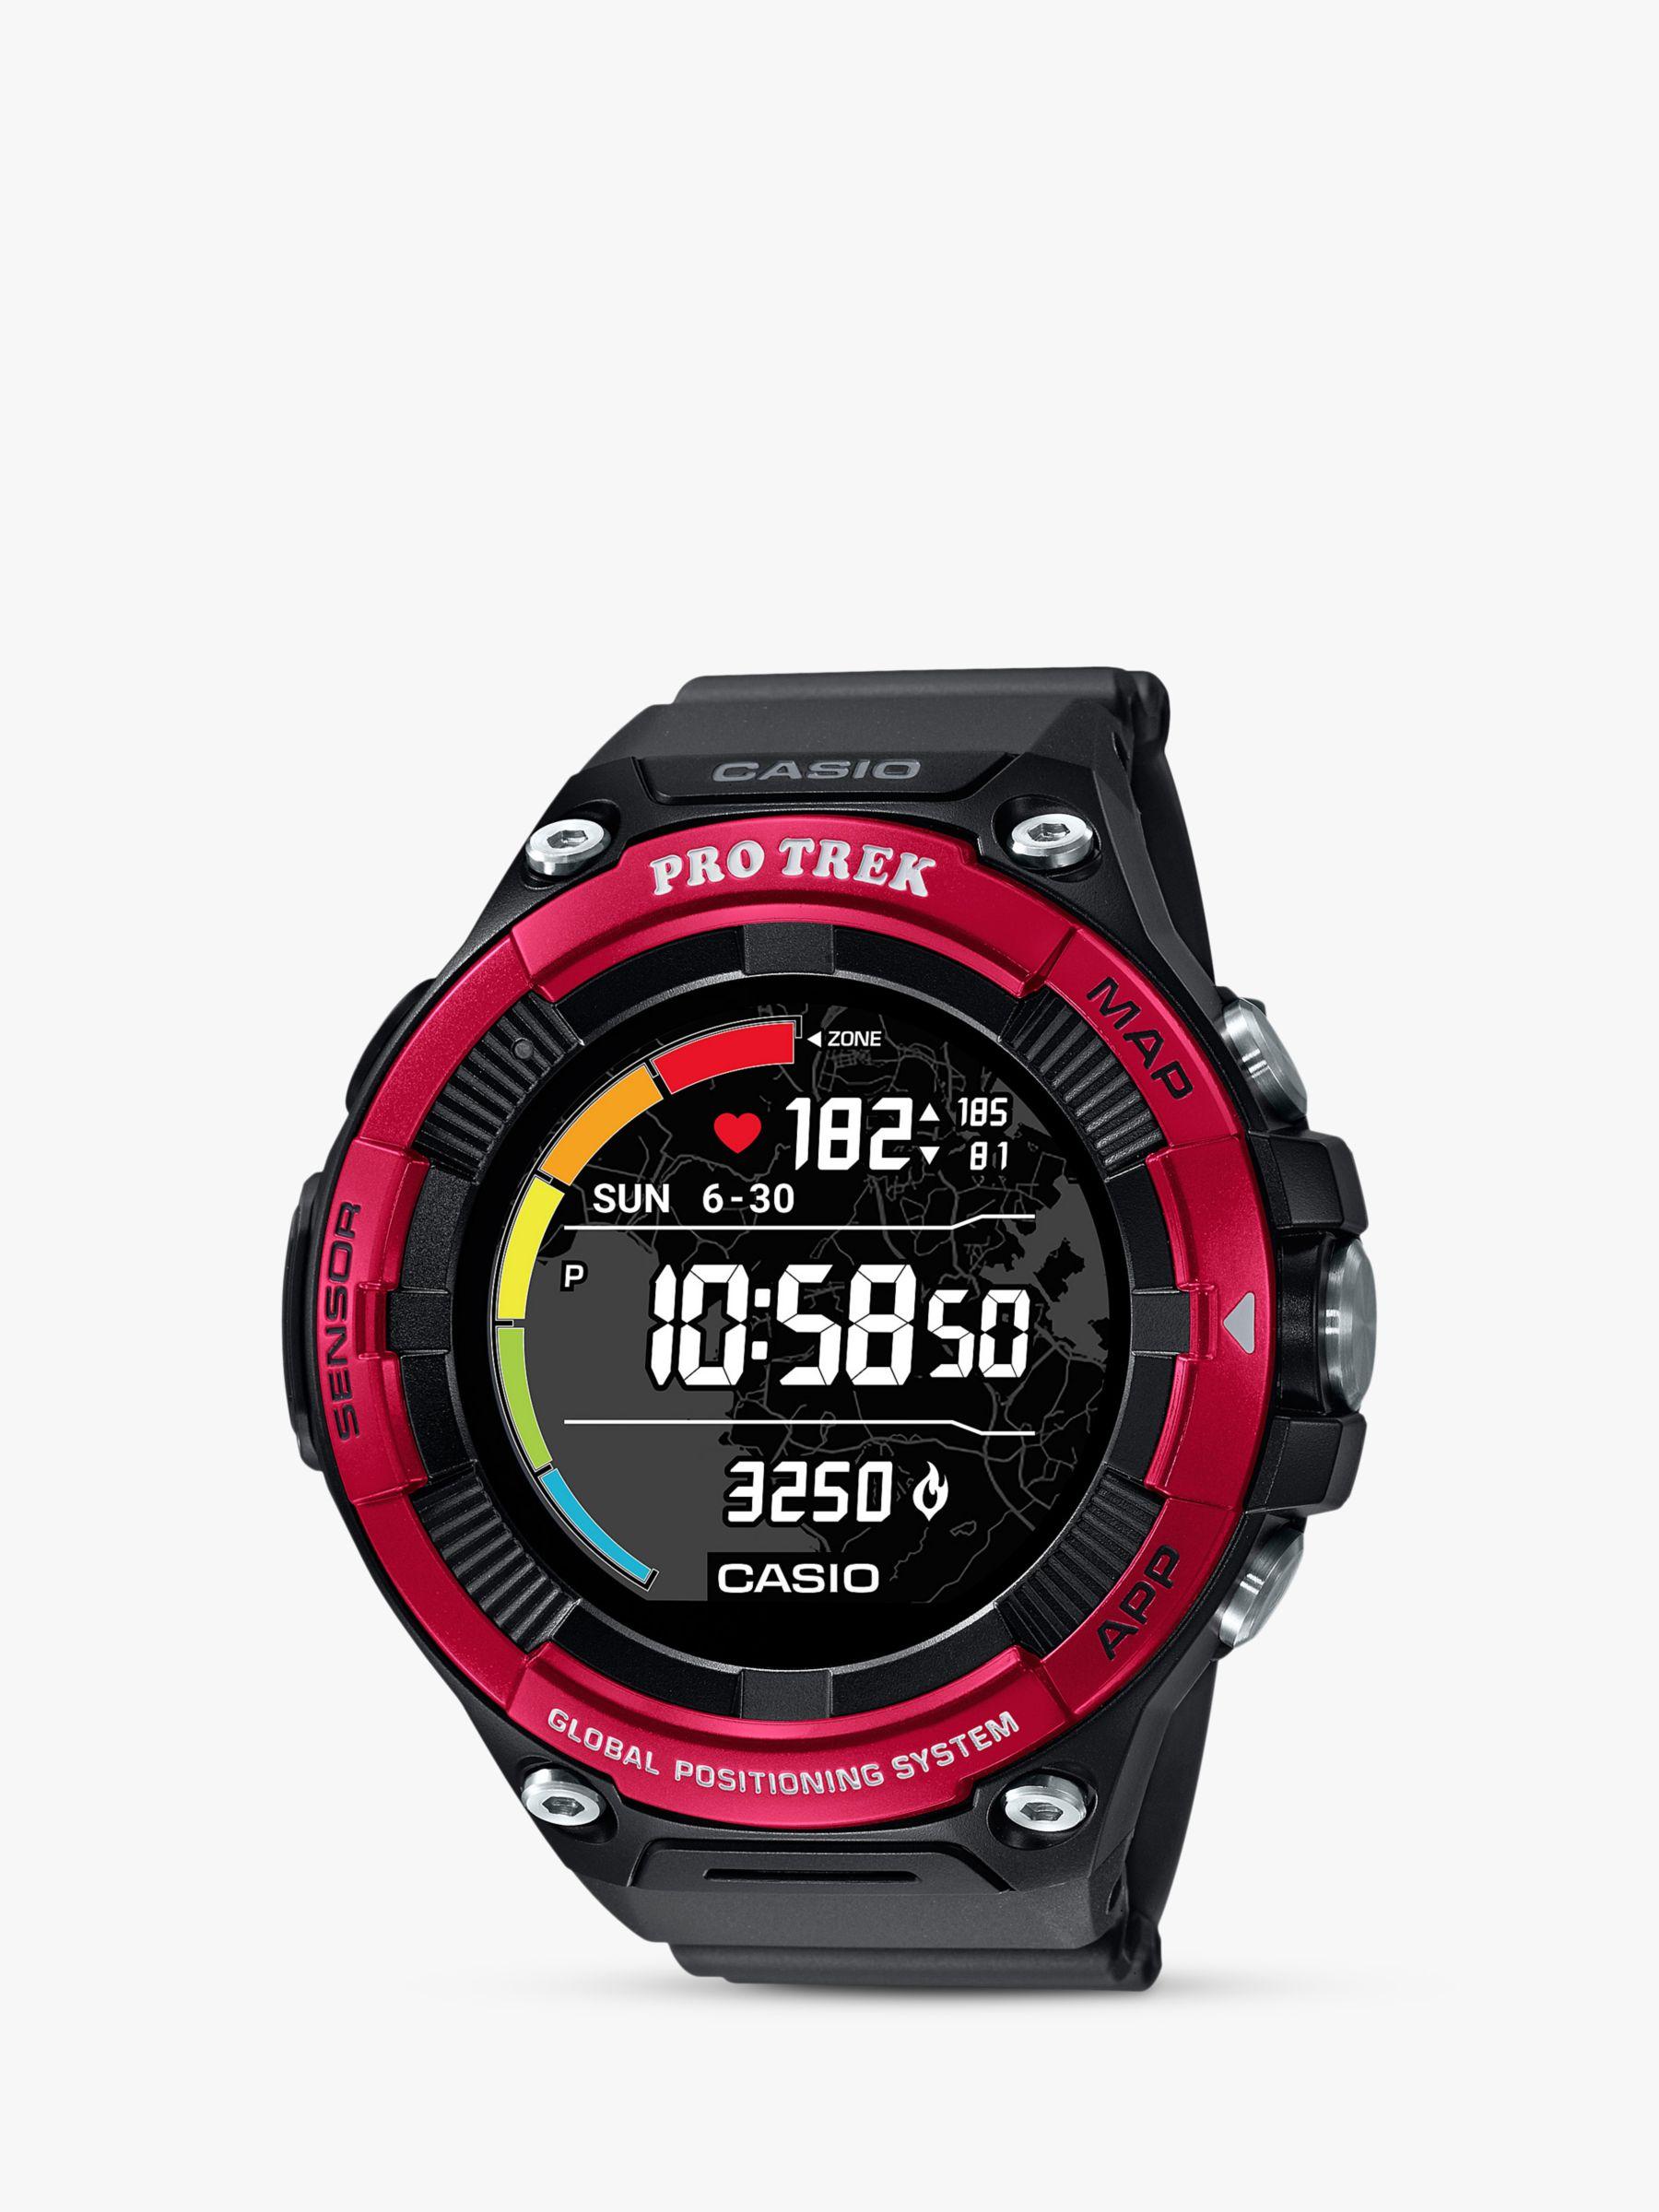 Casio Casio Unisex ProTrek Smart 21 Bluetooth GPS Touch Screen Resin Strap Watch